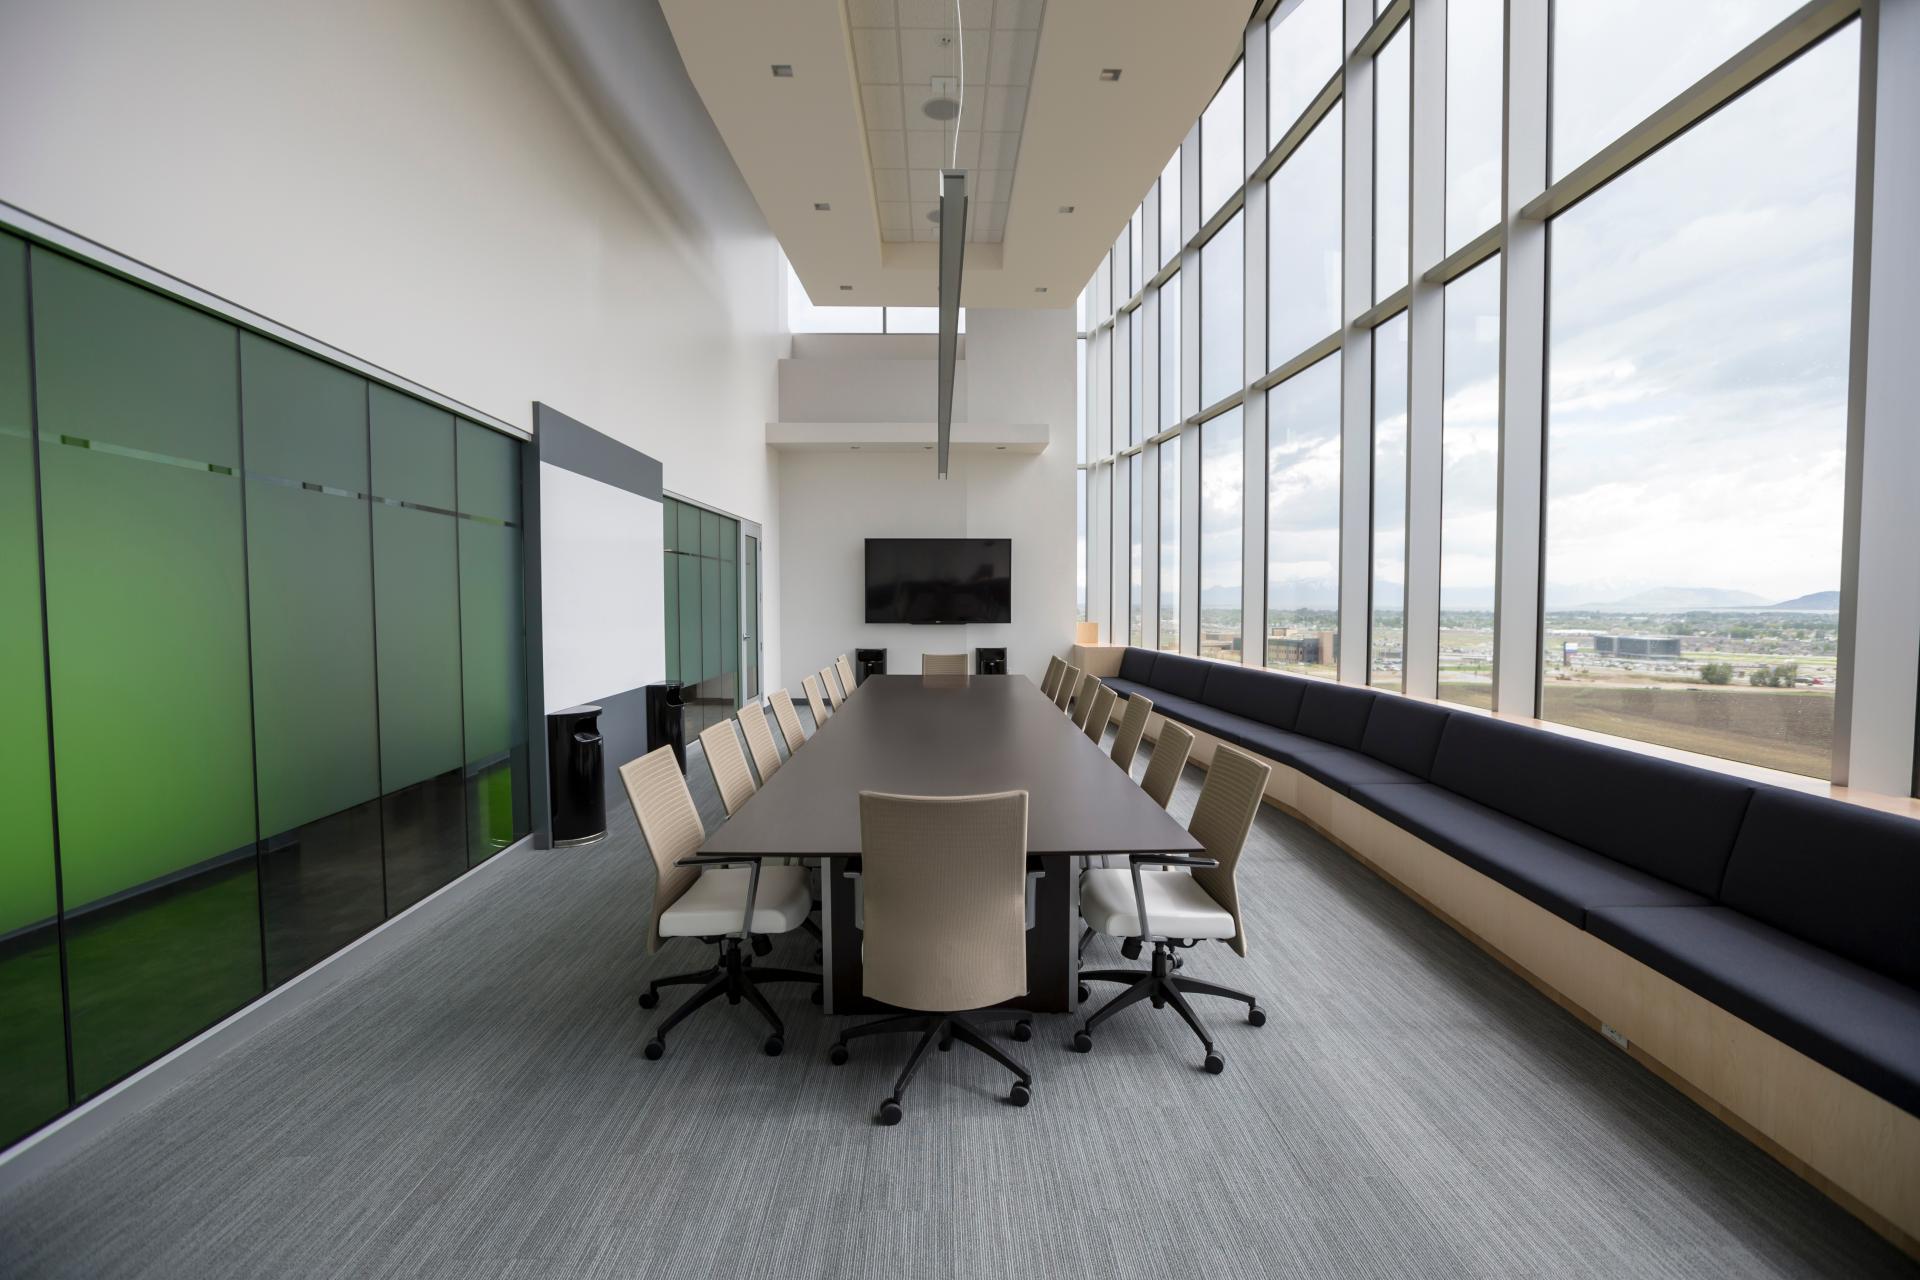 tastefully-decorarated-spacious-office